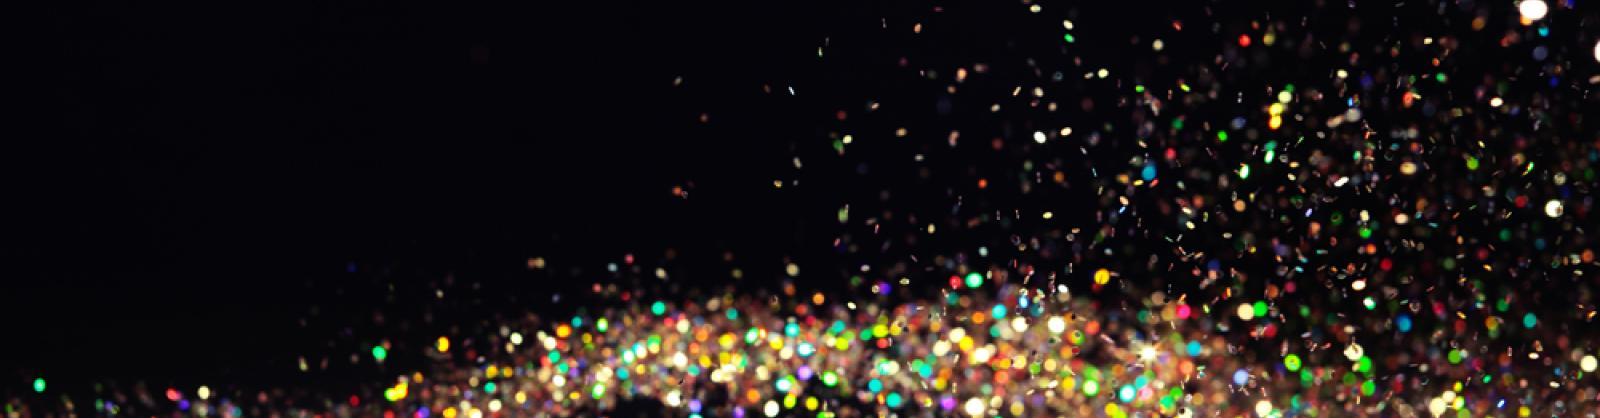 Celebratory glitter